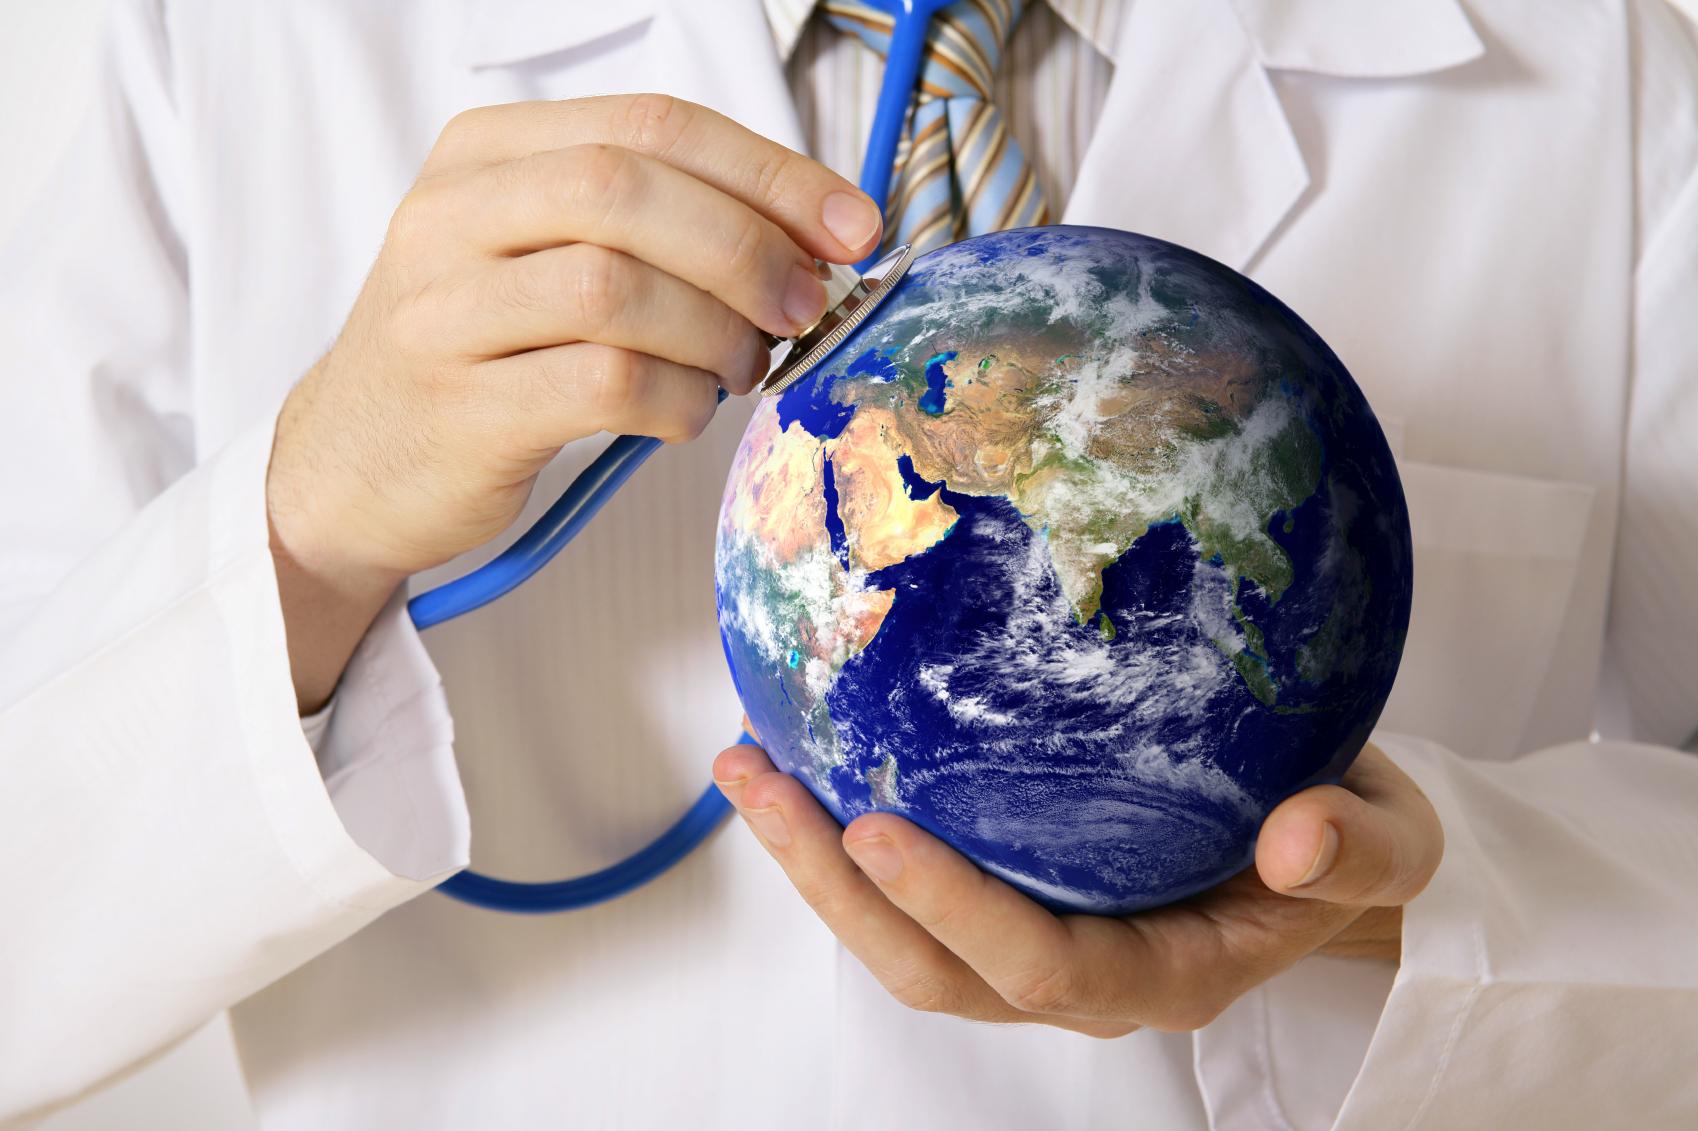 costa rica medical tourism